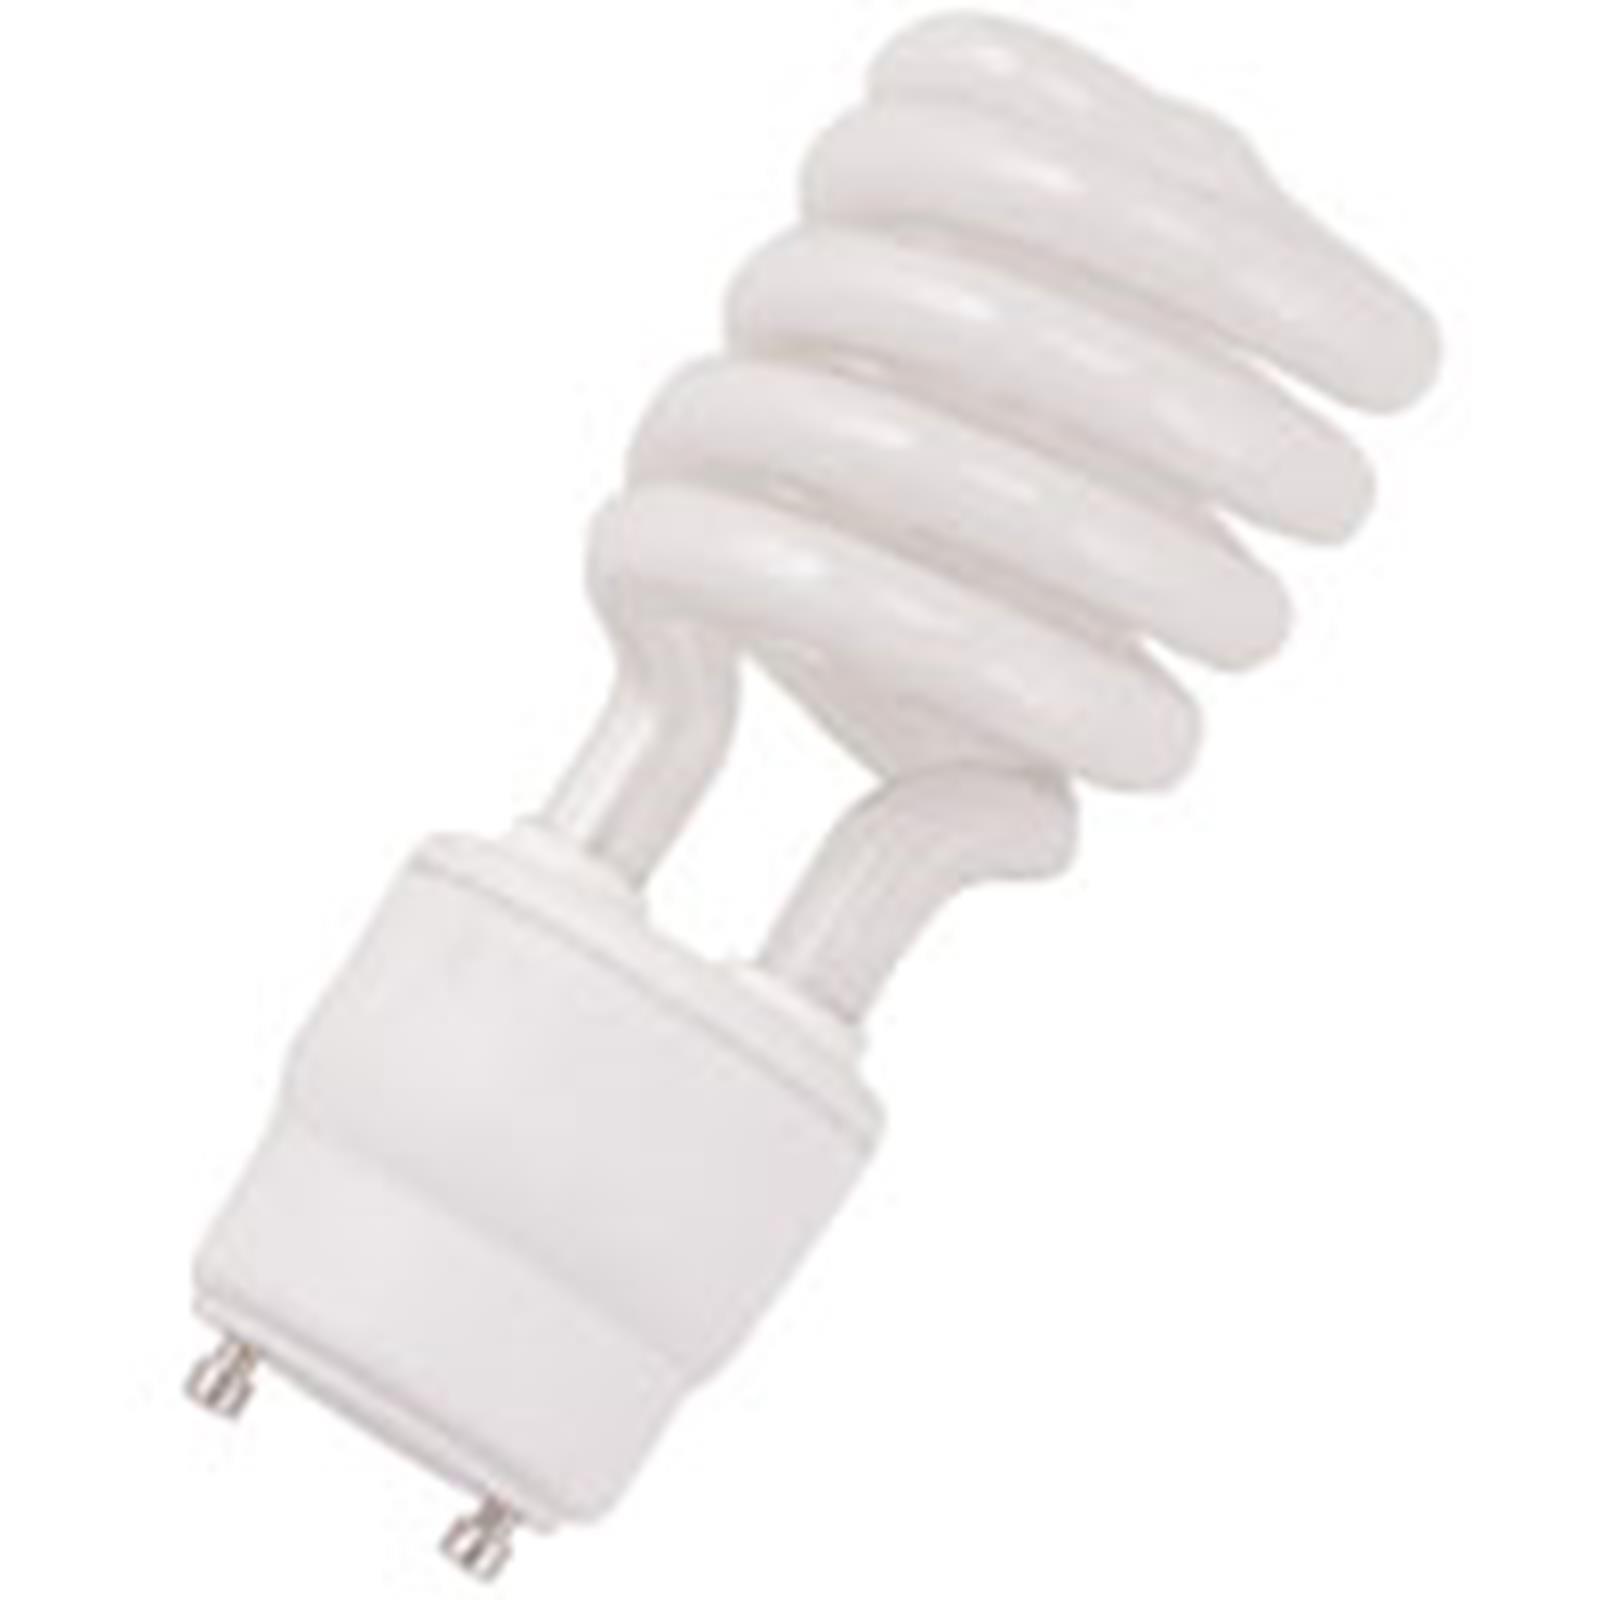 30 Qty. Halco 26W Spiral 5000K GU24 ProLume CFL26/50/GU24 26w 120v CFL Natural White Lamp Bulb